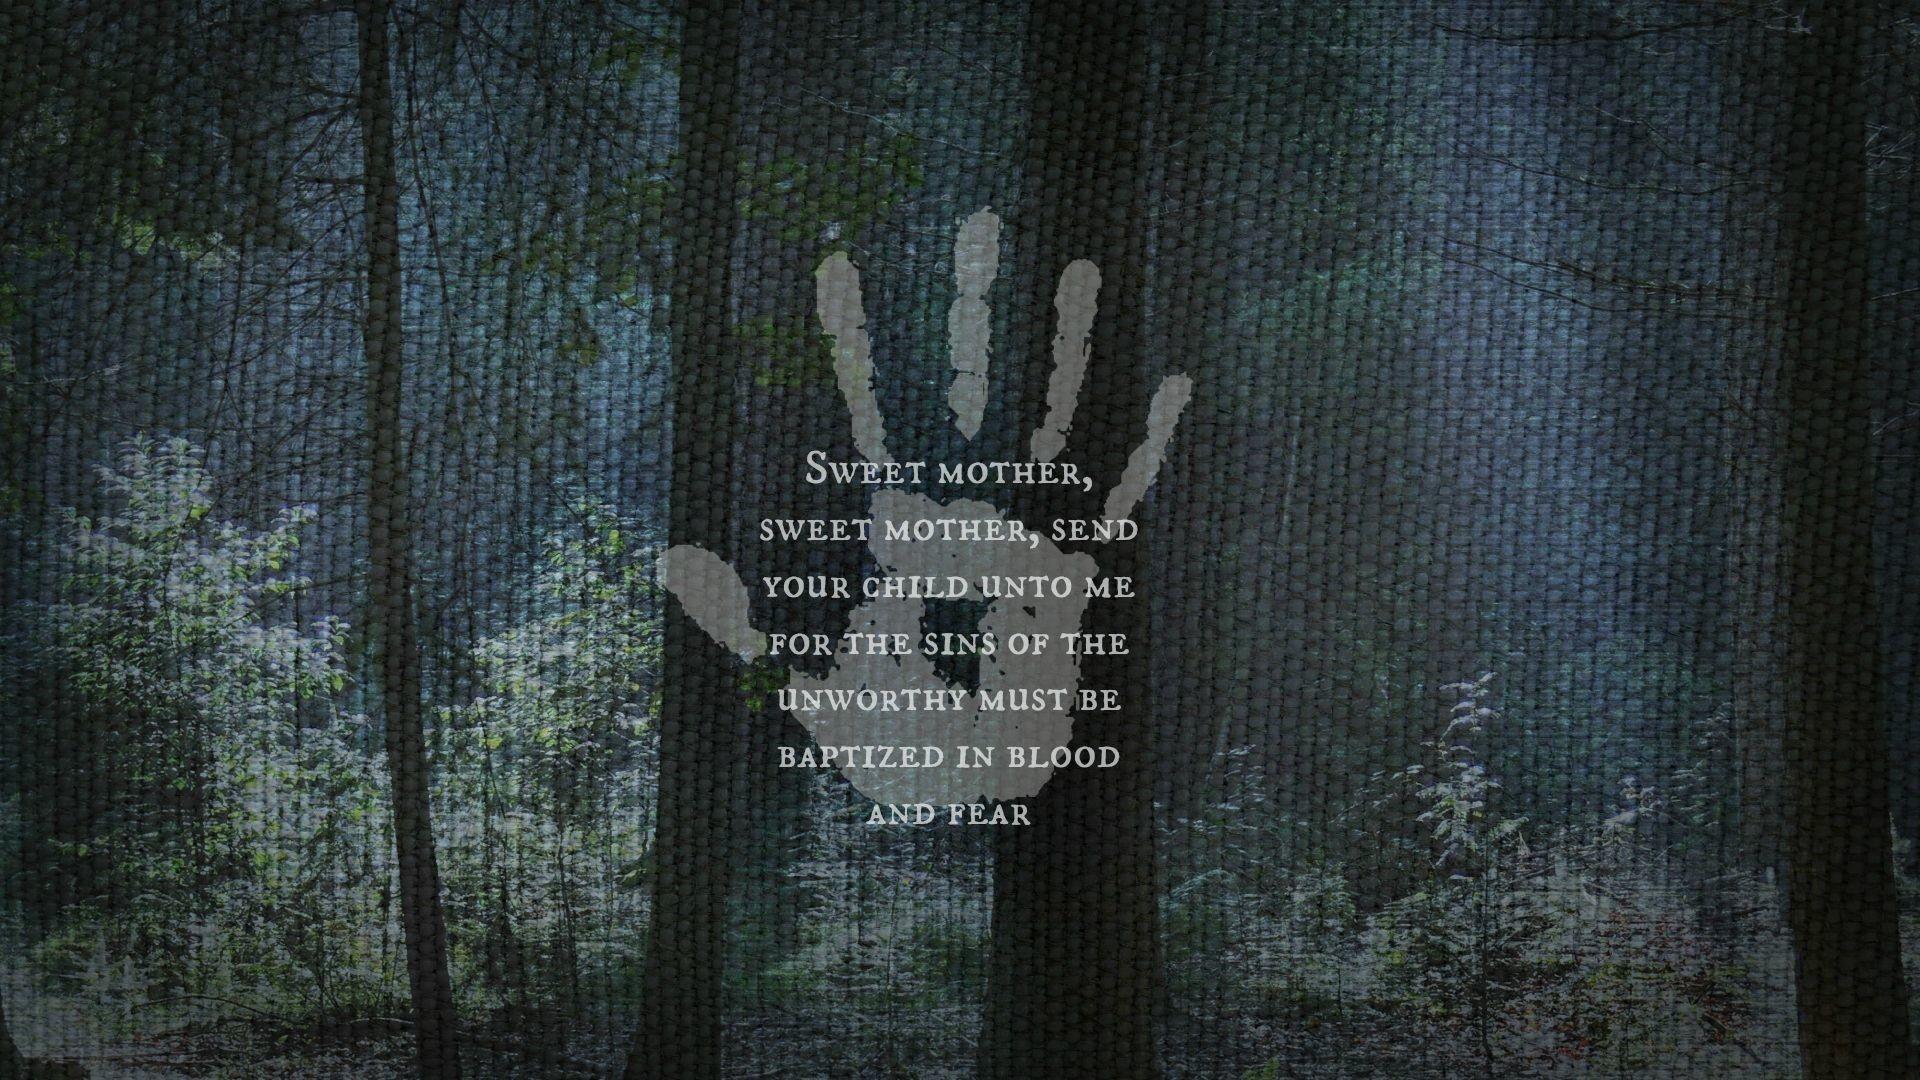 The Elder Scrolls V – Skyrim quote wallpaper, The Elder Scrolls V – Skyrim  quote Game HD desktop wallpaper